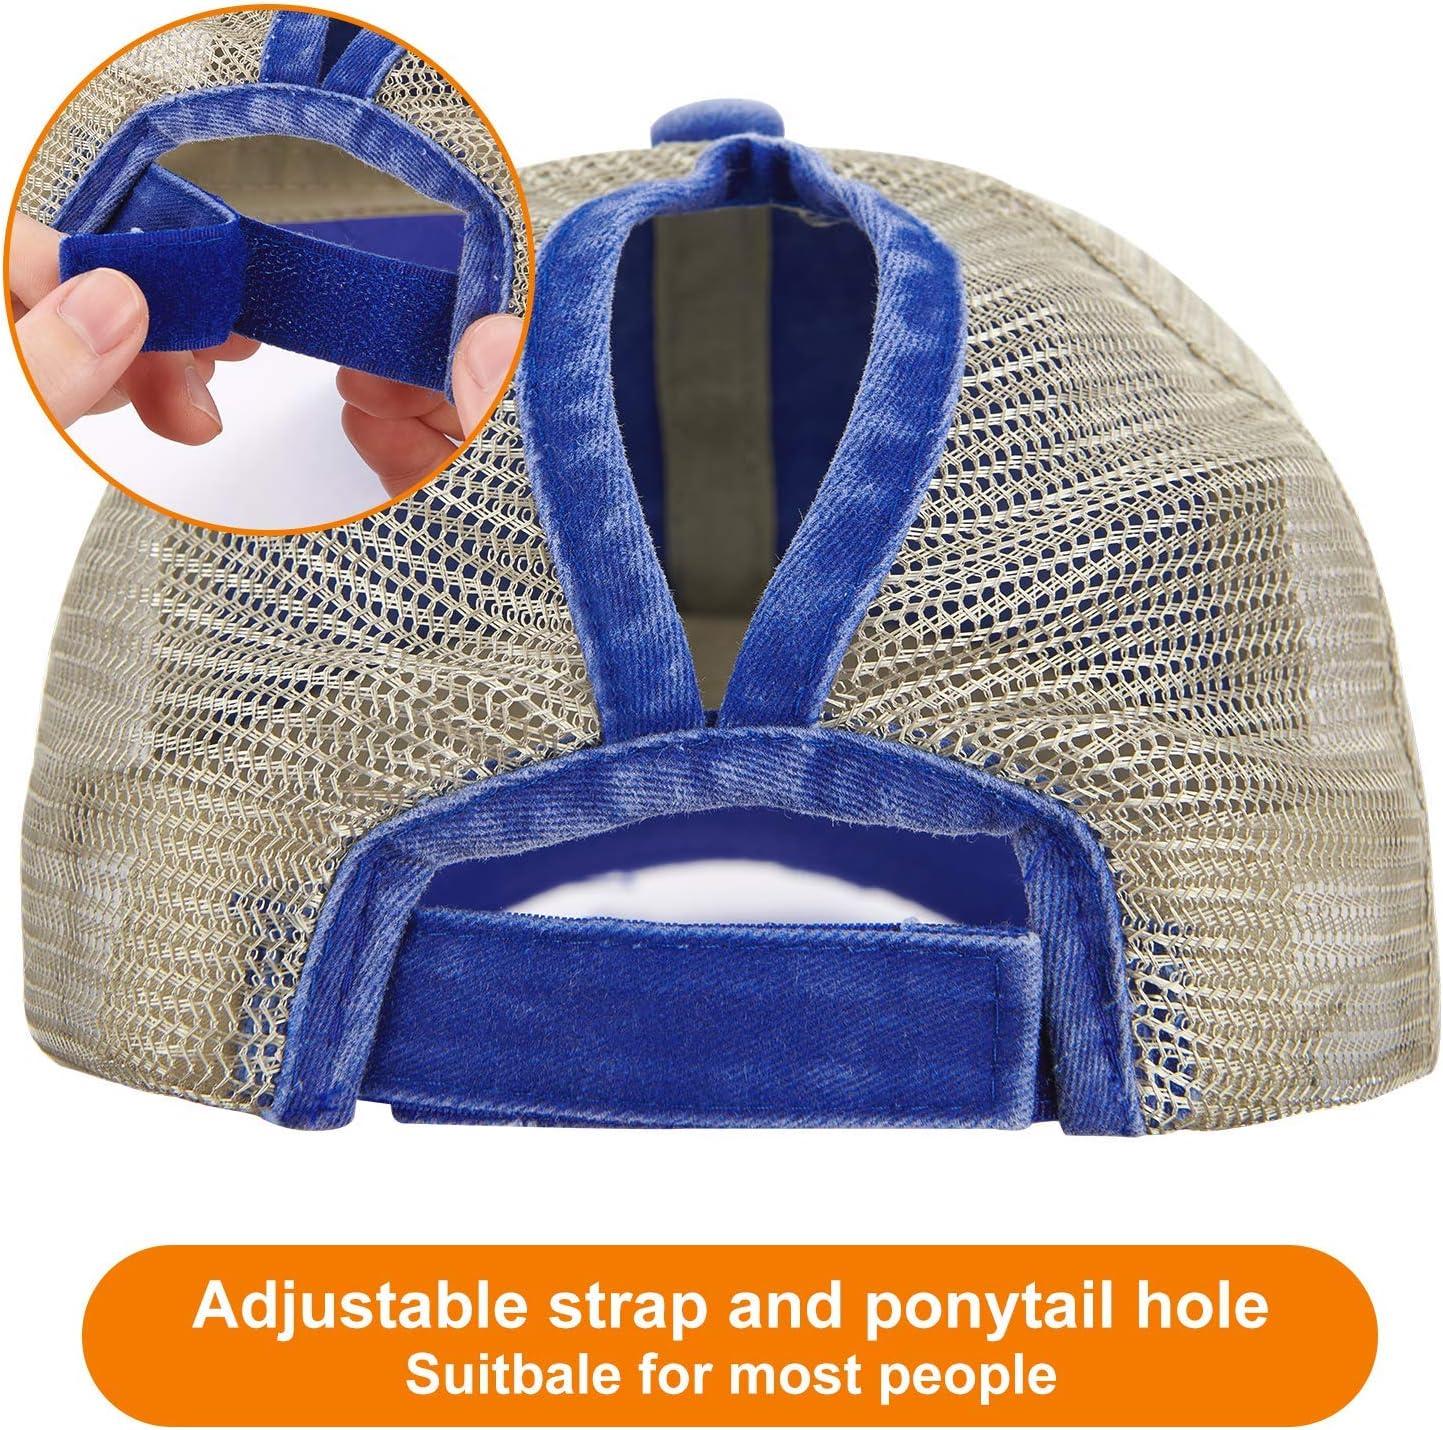 LIVACASA 1PC Baseball Cap With Ponytail Hole Half Mesh Outdoor Sport Ladies Summer Baseball Caps Sunscreen Adjustable Hat 22.5-25.5Inches